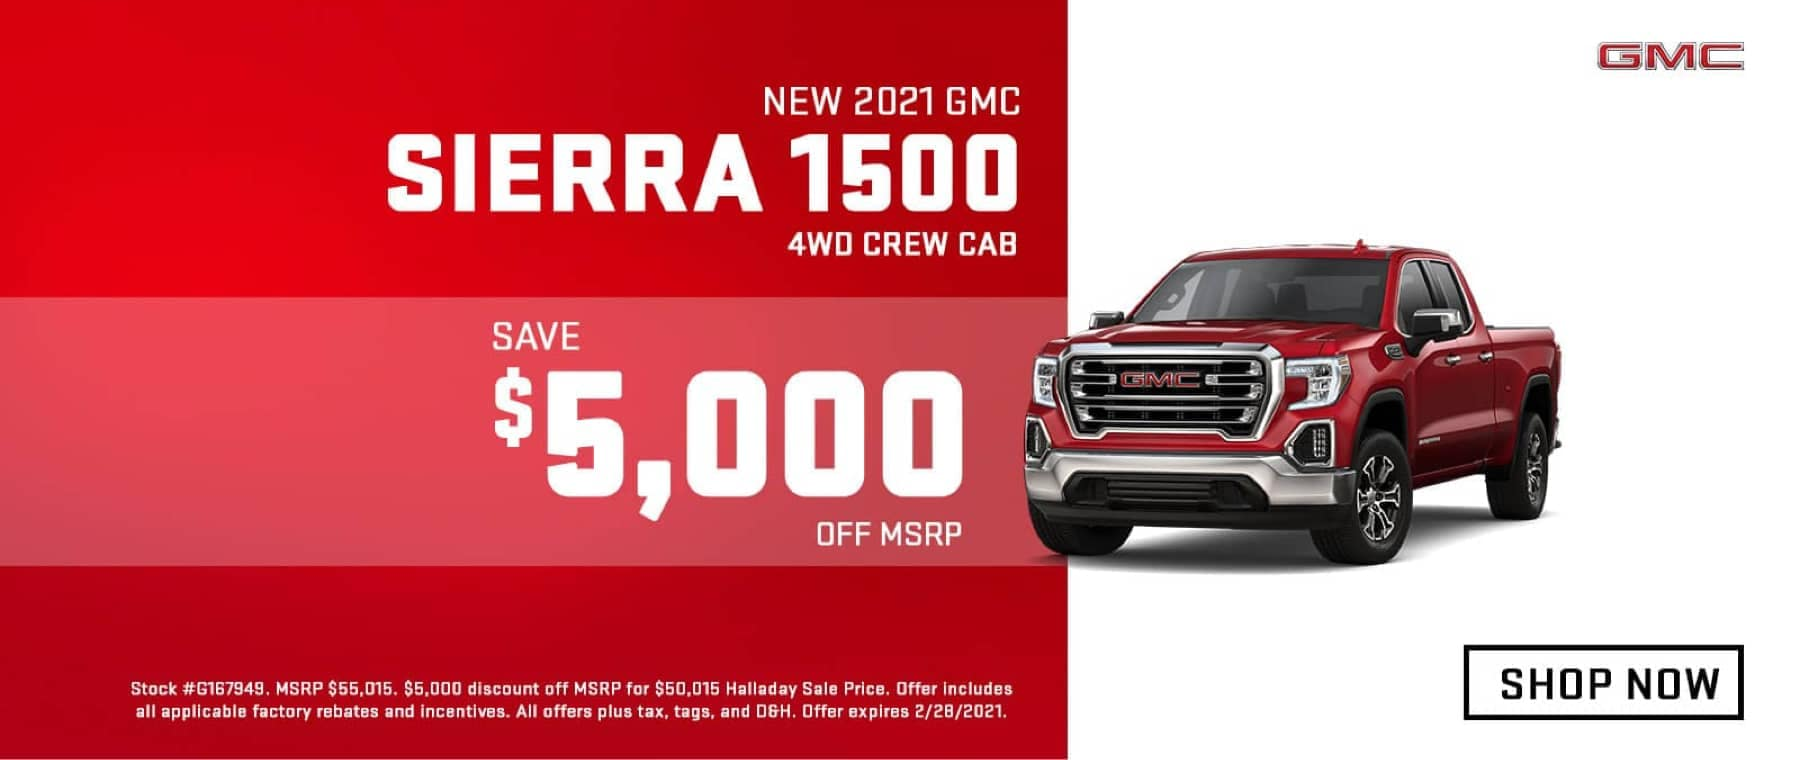 HM-GM-SIERRA-1500